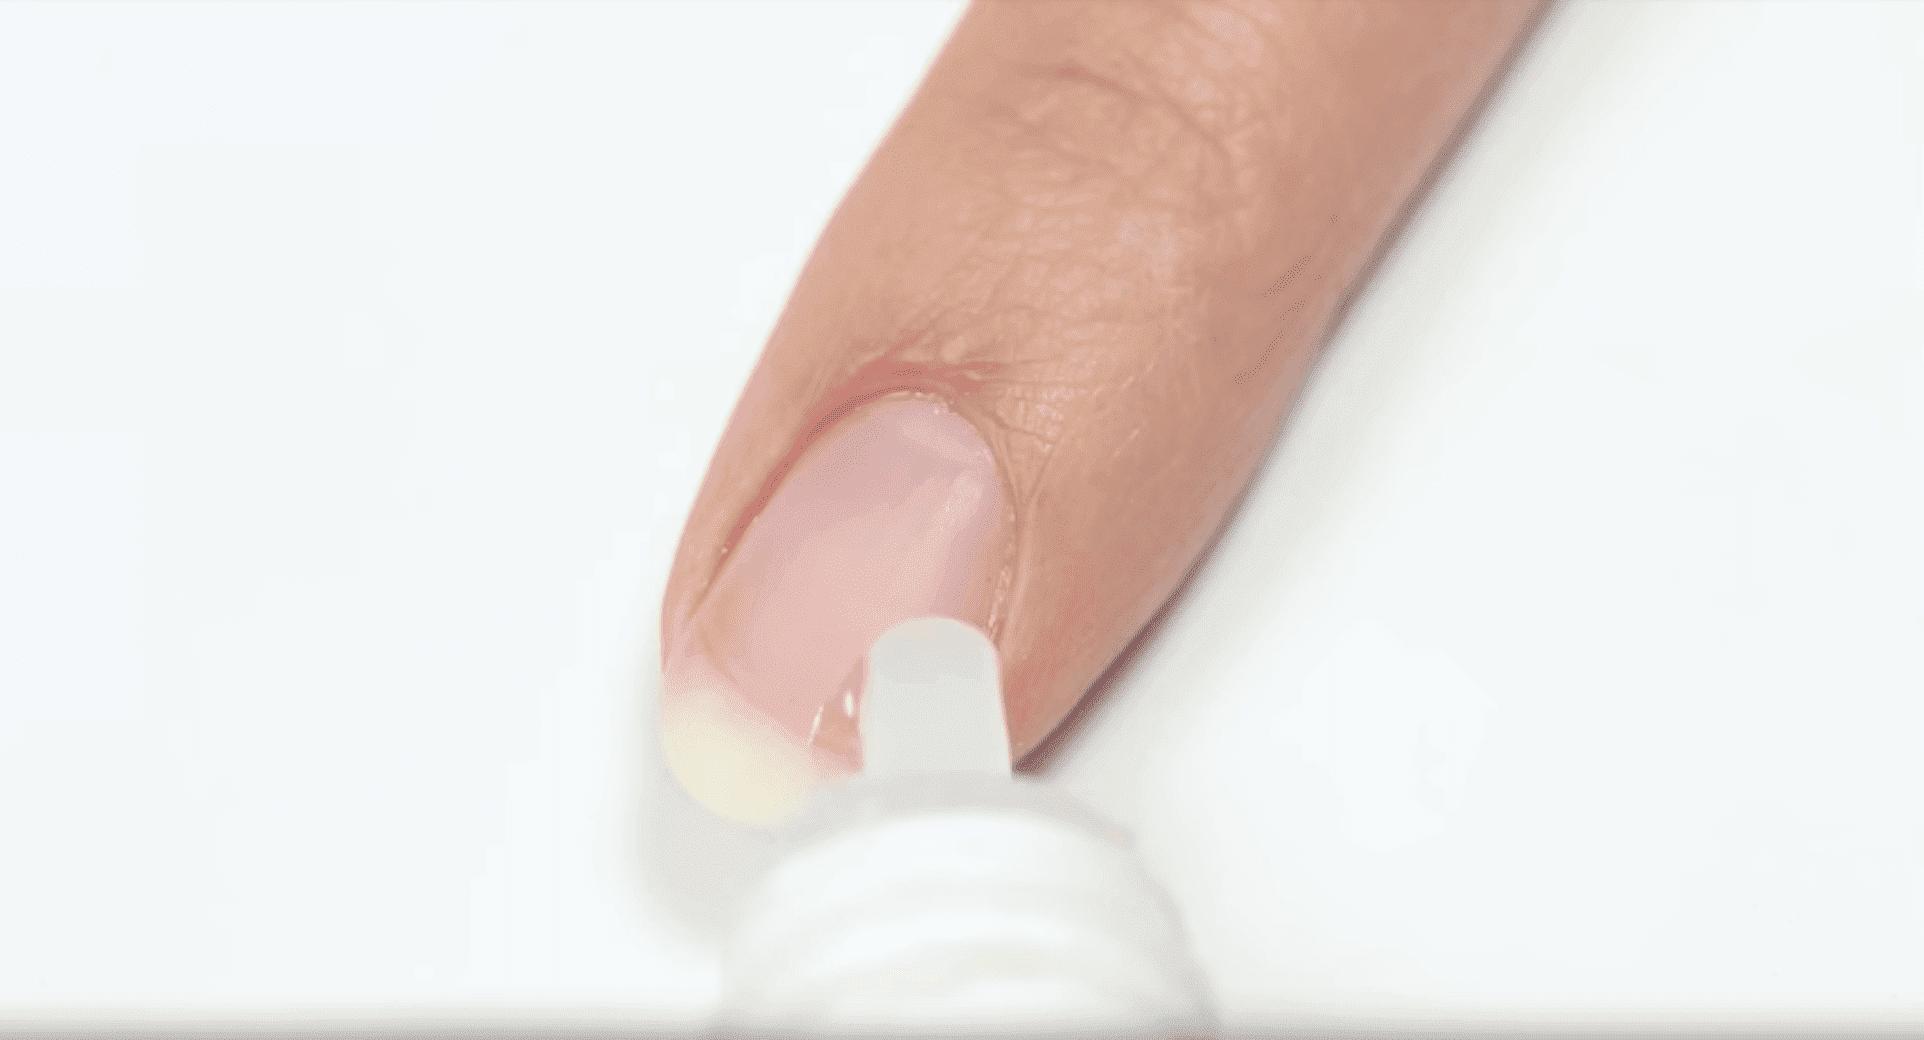 A drop of glue. I Image: YouTube/ HannahRoxNails.